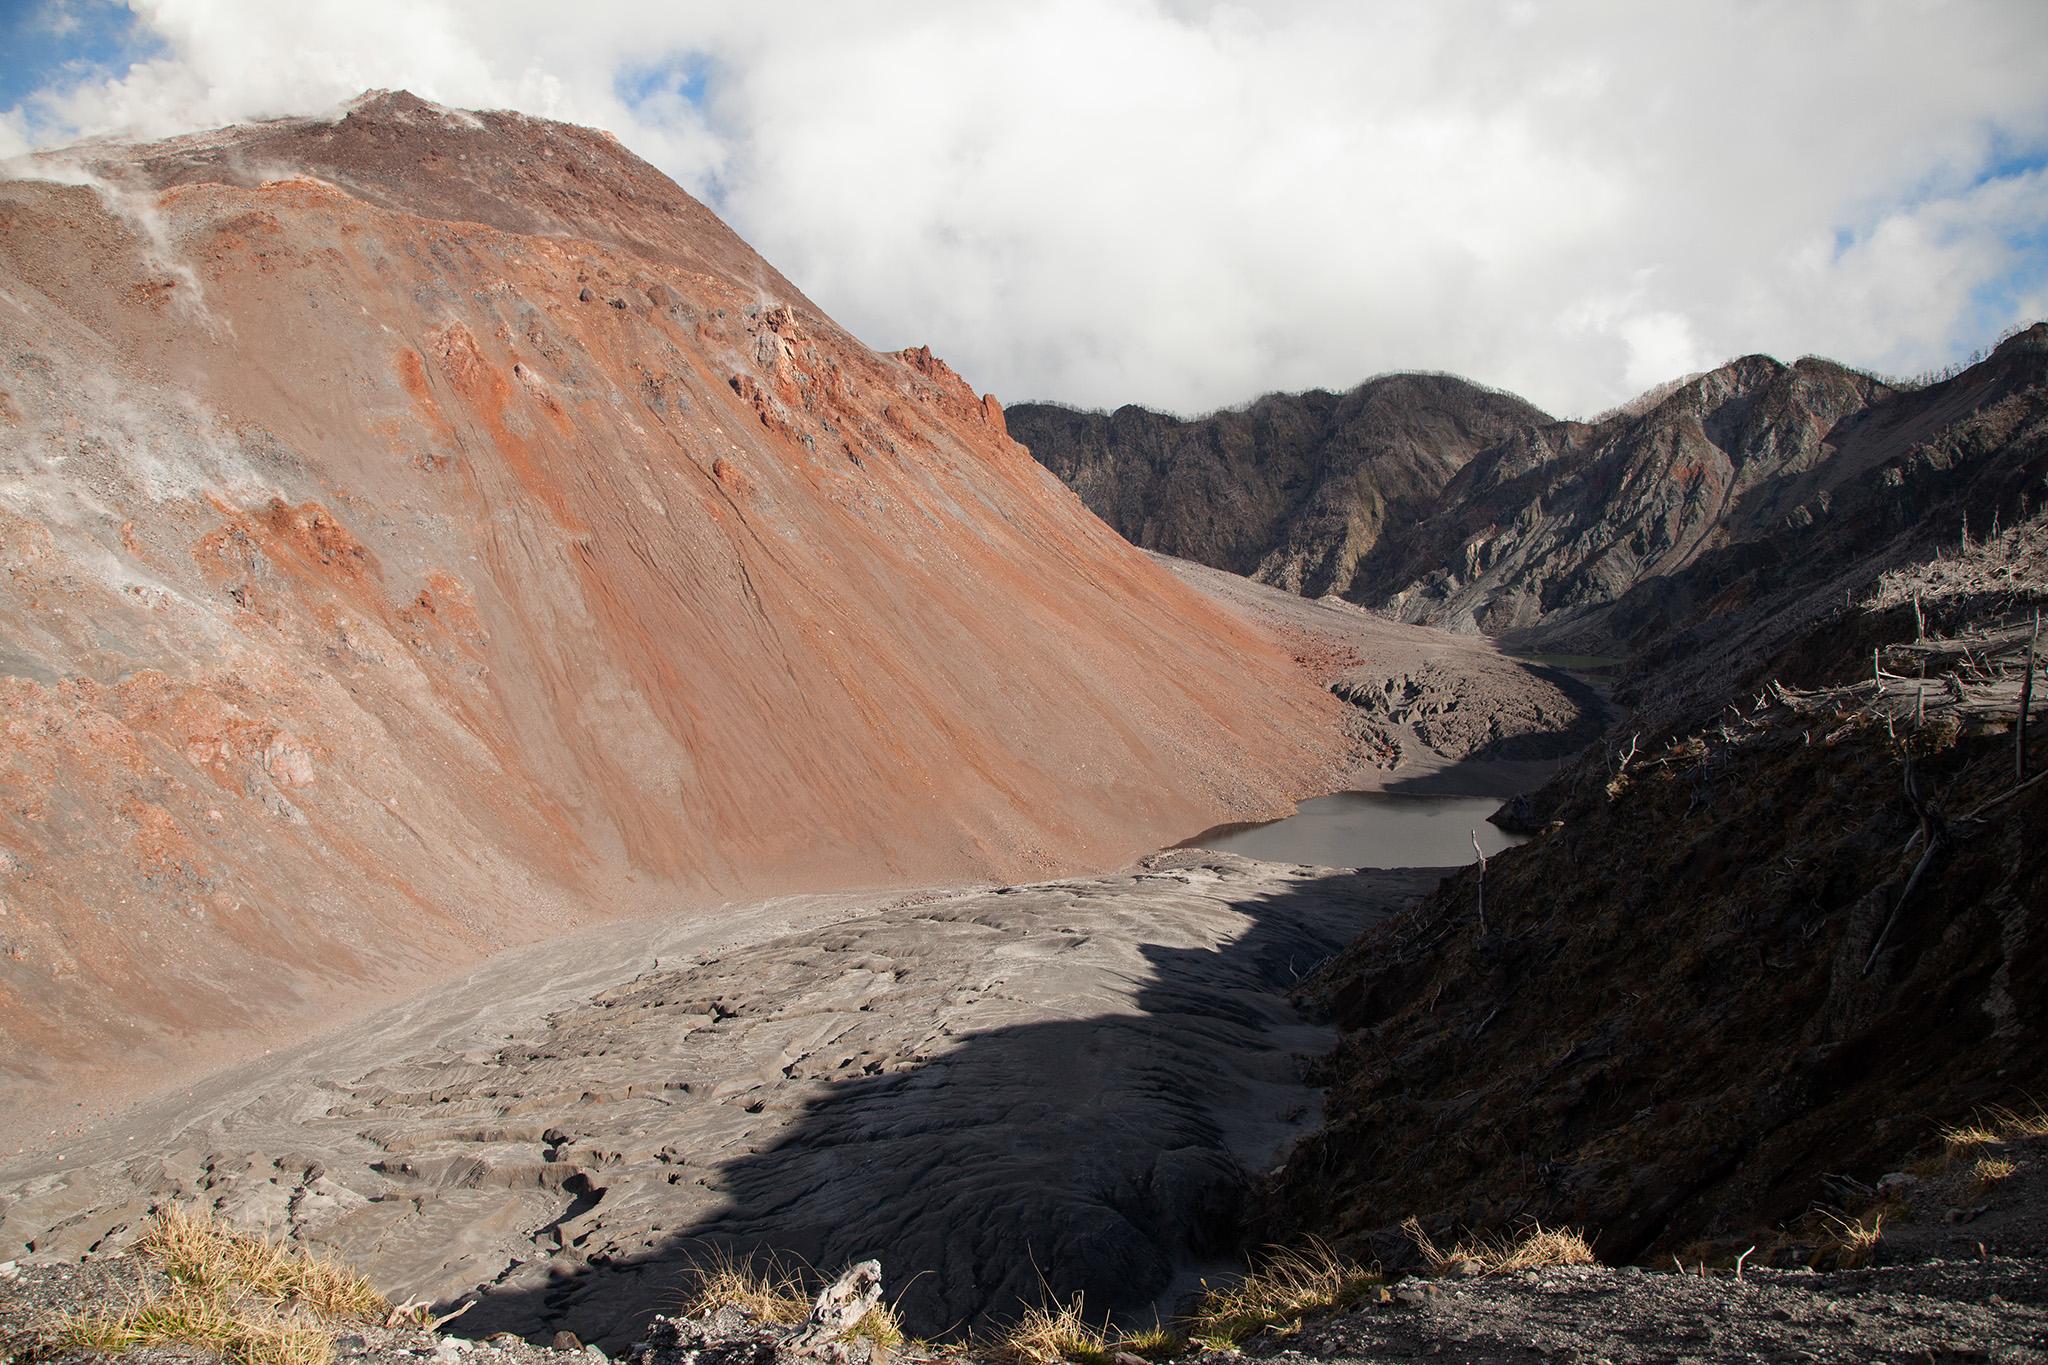 013-TW-Patagonia-140824.jpg